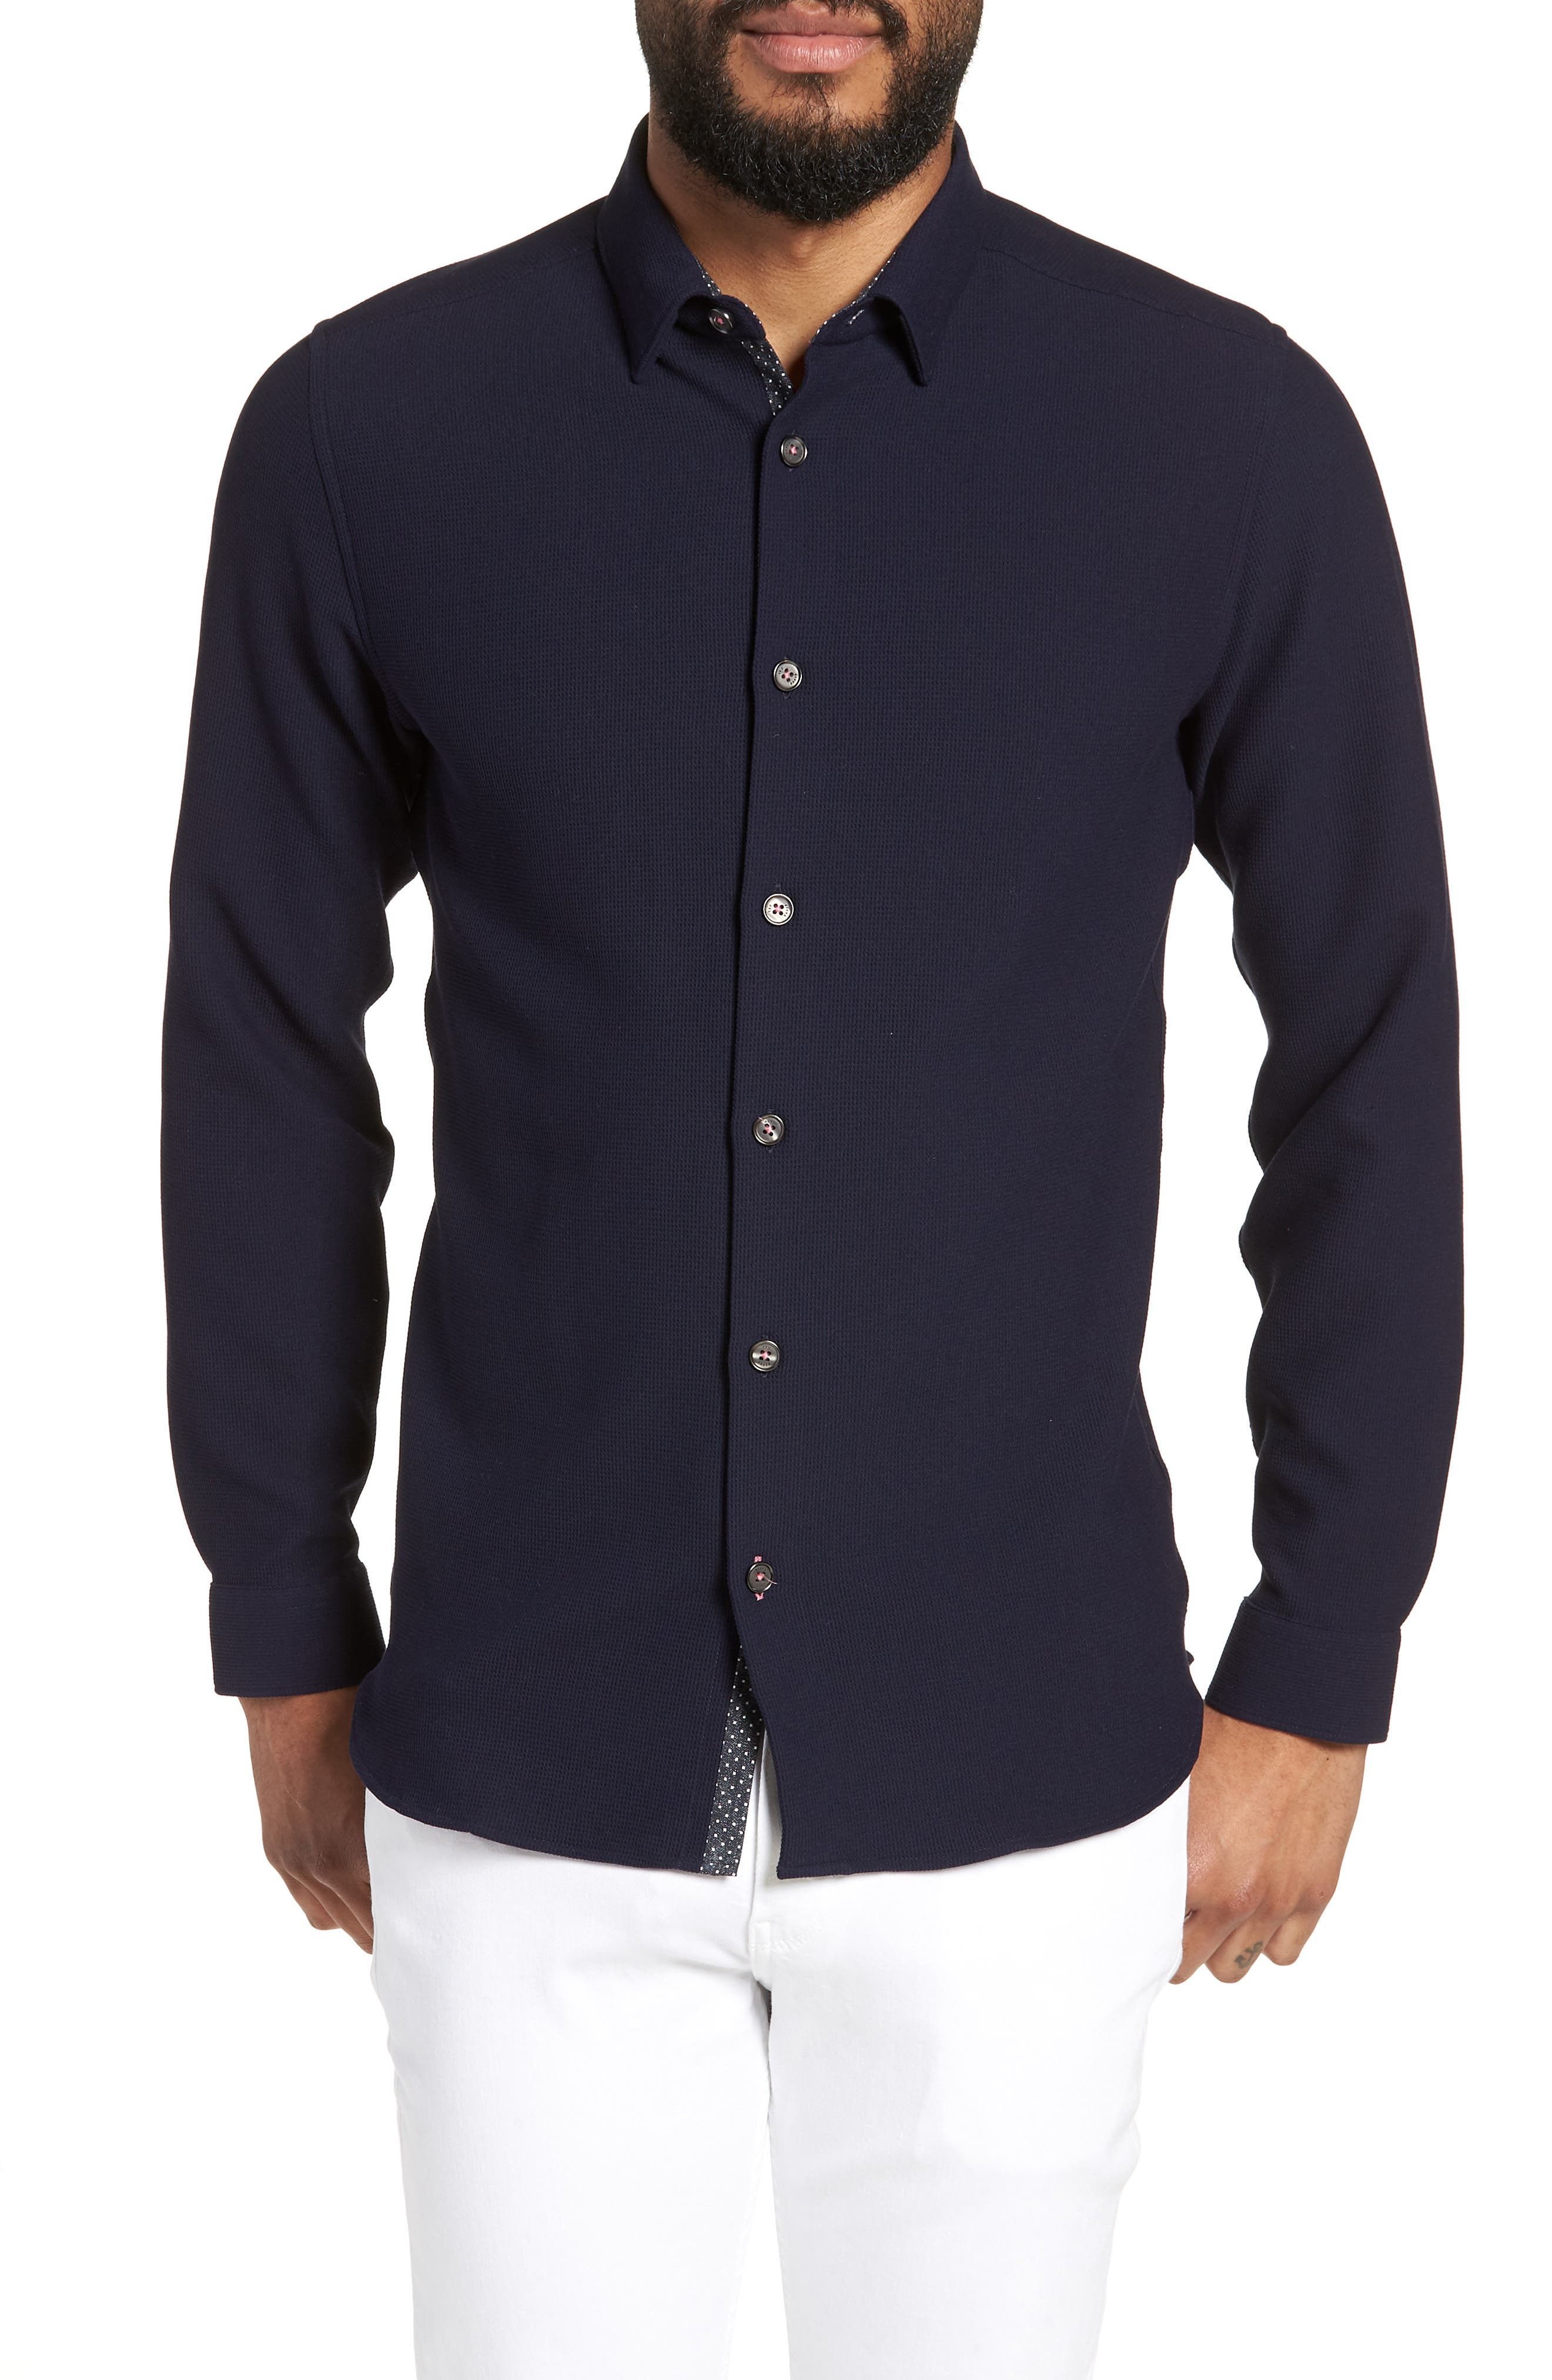 Loretax Trim Fit Stretch Knit Sport Shirt,                         Main,                         color,